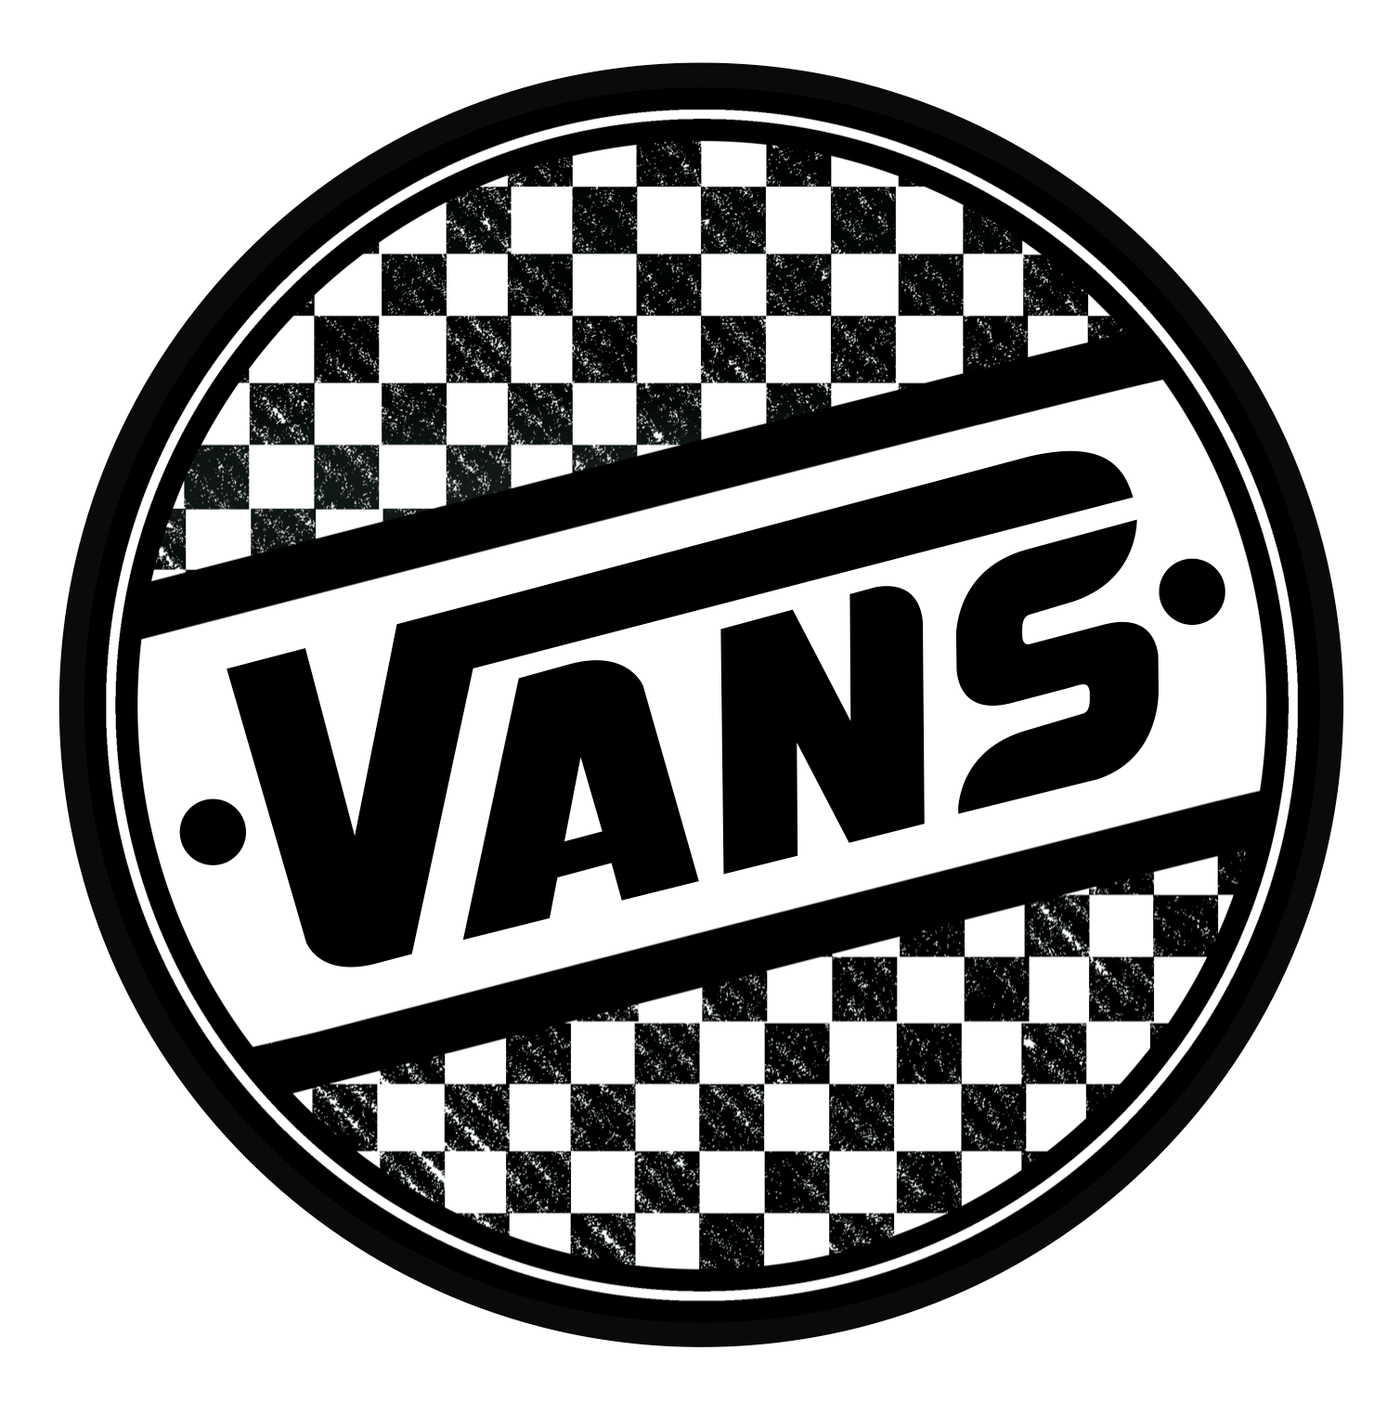 Vans T-shirt Designs/logos by Lee Baker at Coroflot.com